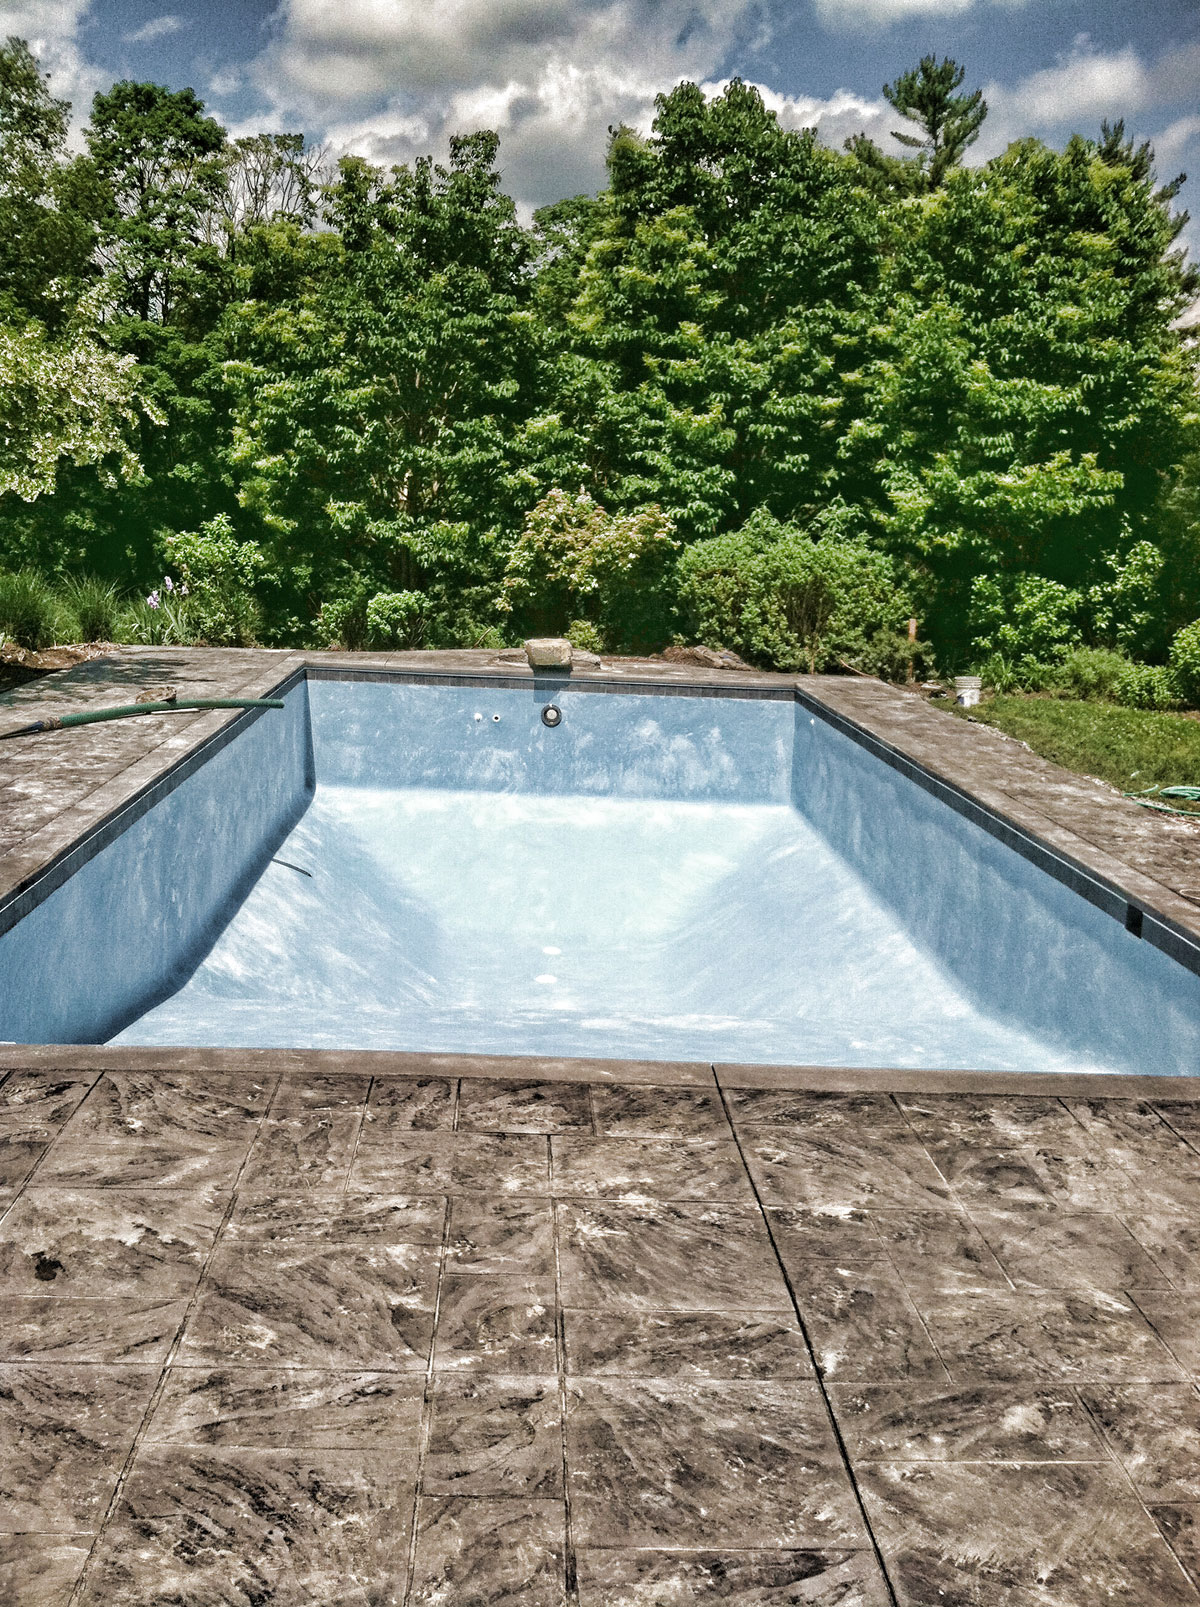 Pools and Patios 2